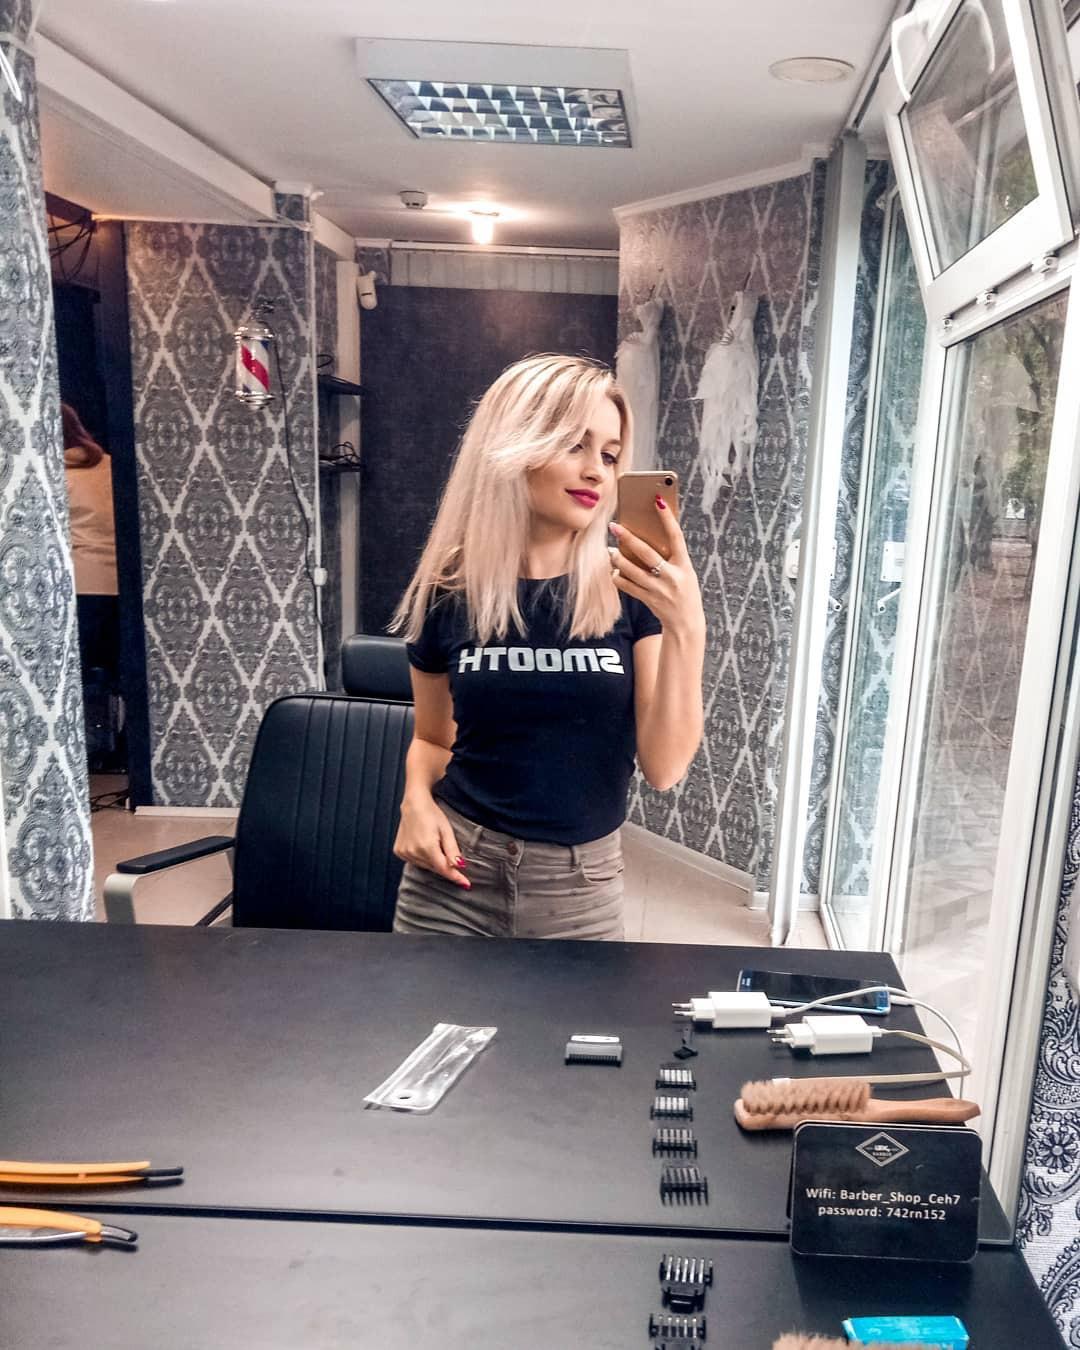 Aleksandra Glance hot girls photoshoot, beautiful girls pictures, in blond hairs